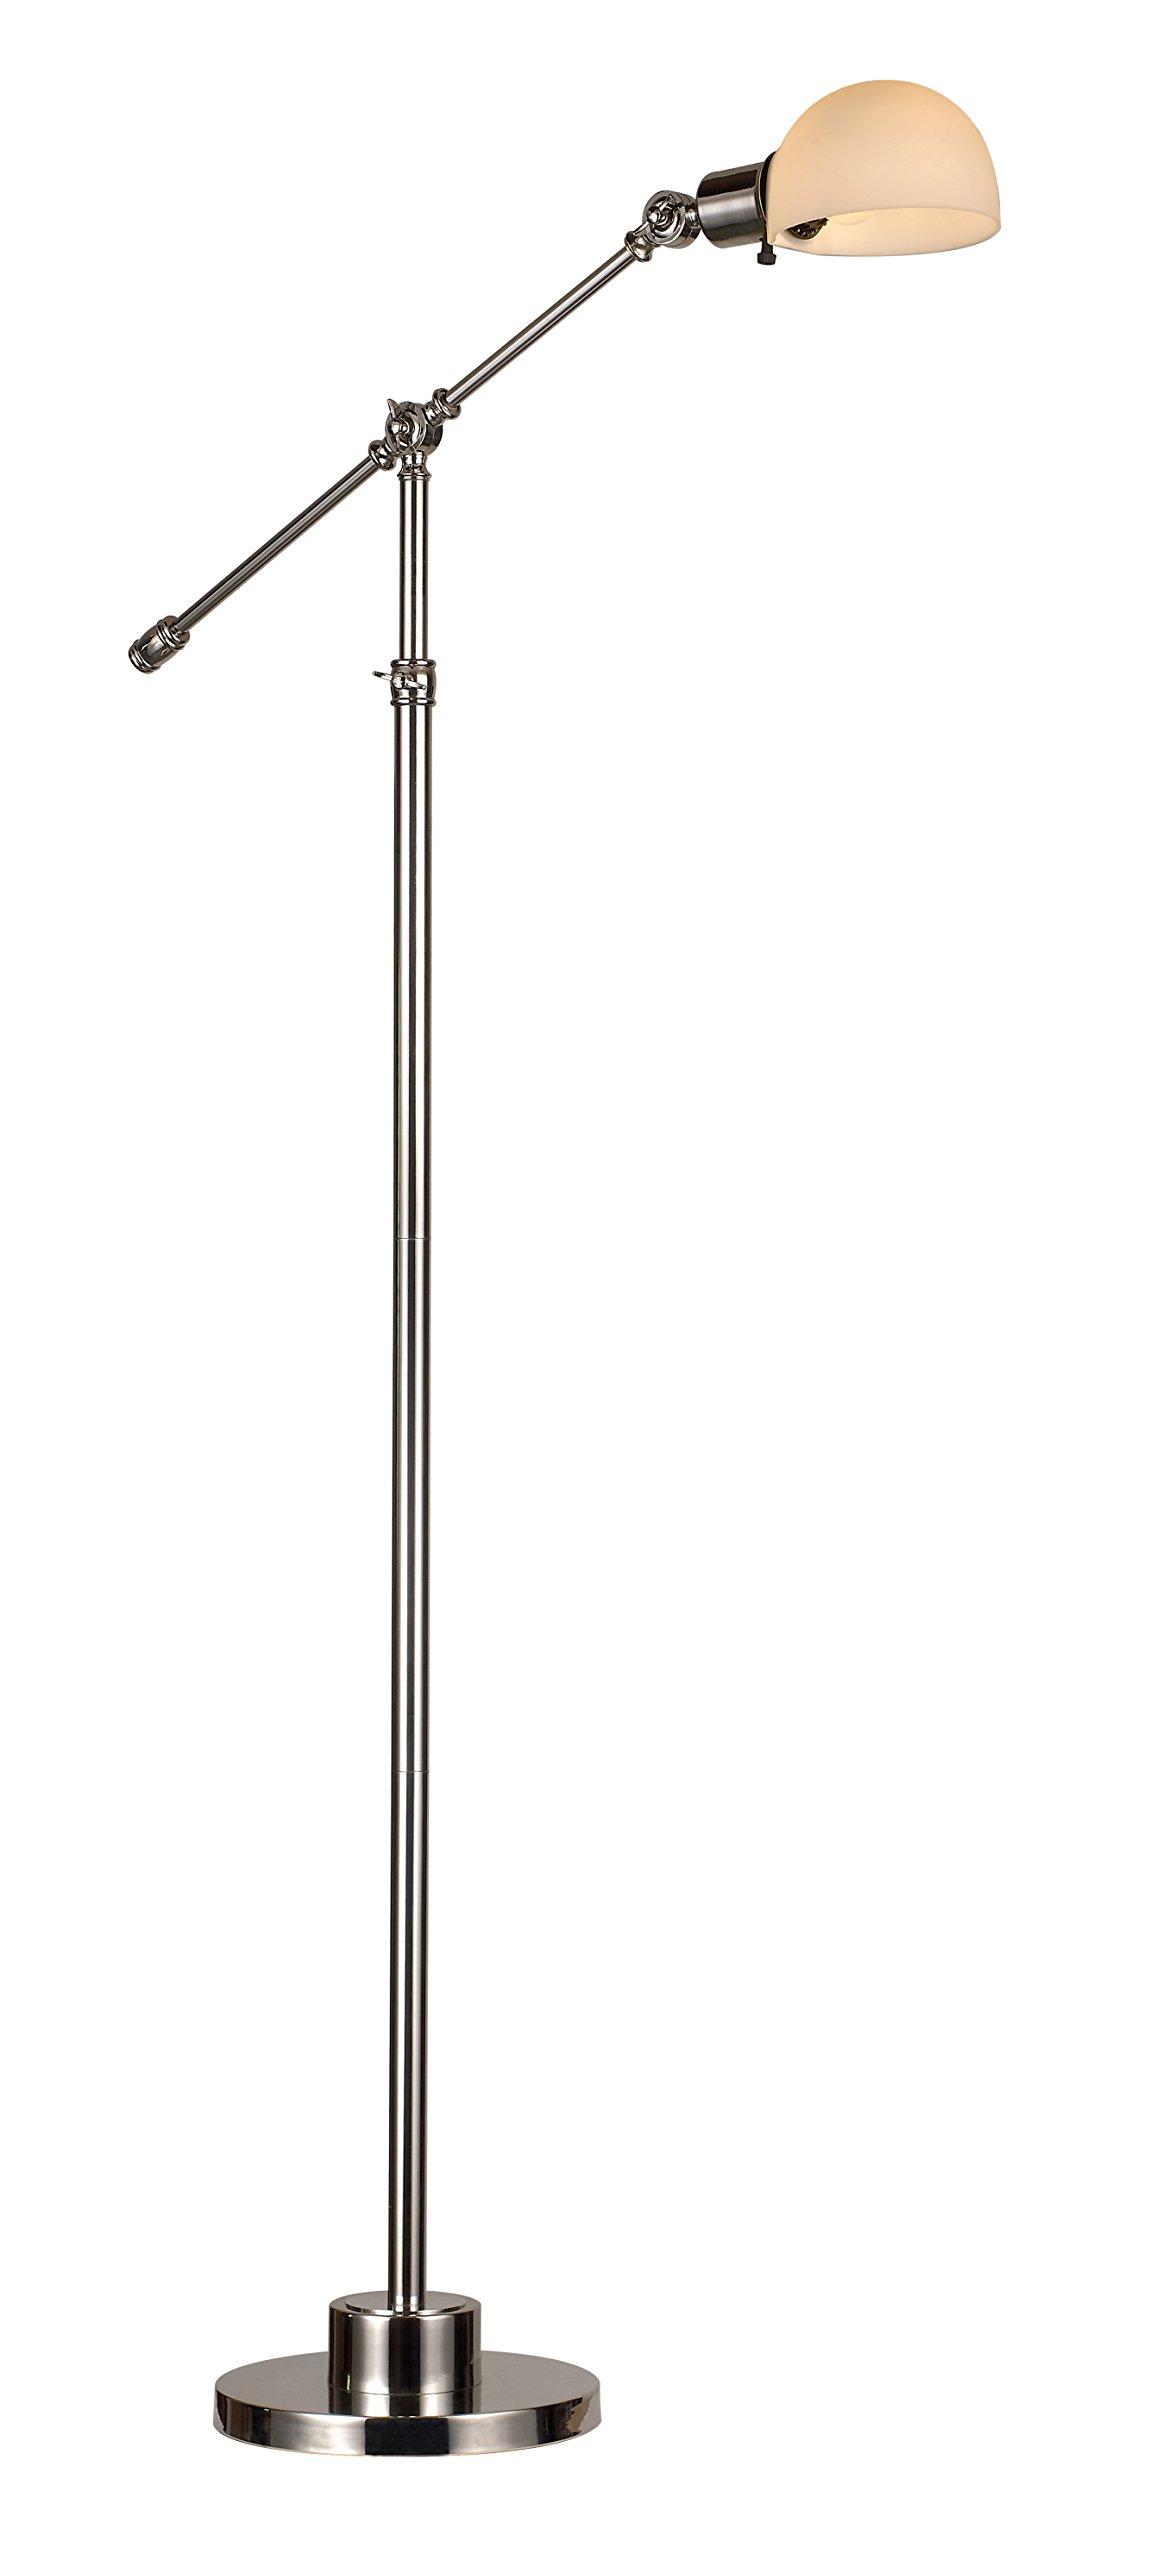 Trans Globe Lighting RTL-8856 Counterbalance Floor Lamp, Nickel